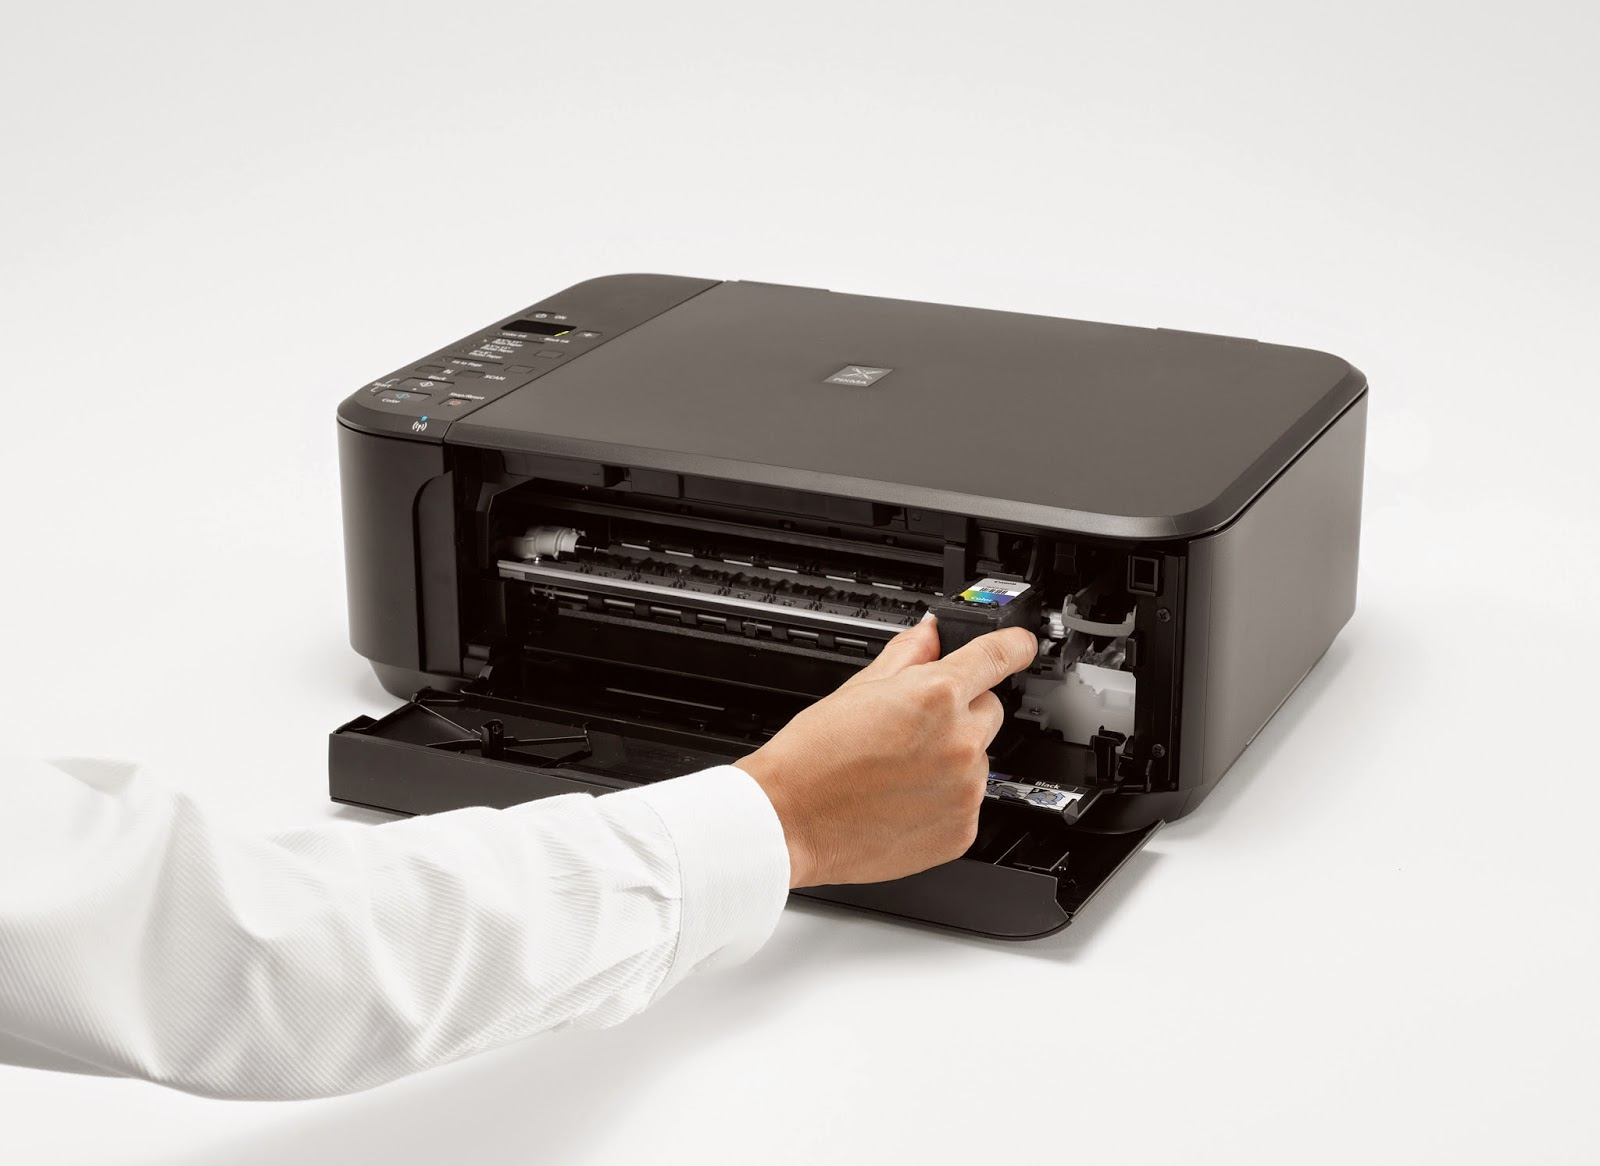 How To Remove Printer Canon Mg Mg2220 Driver